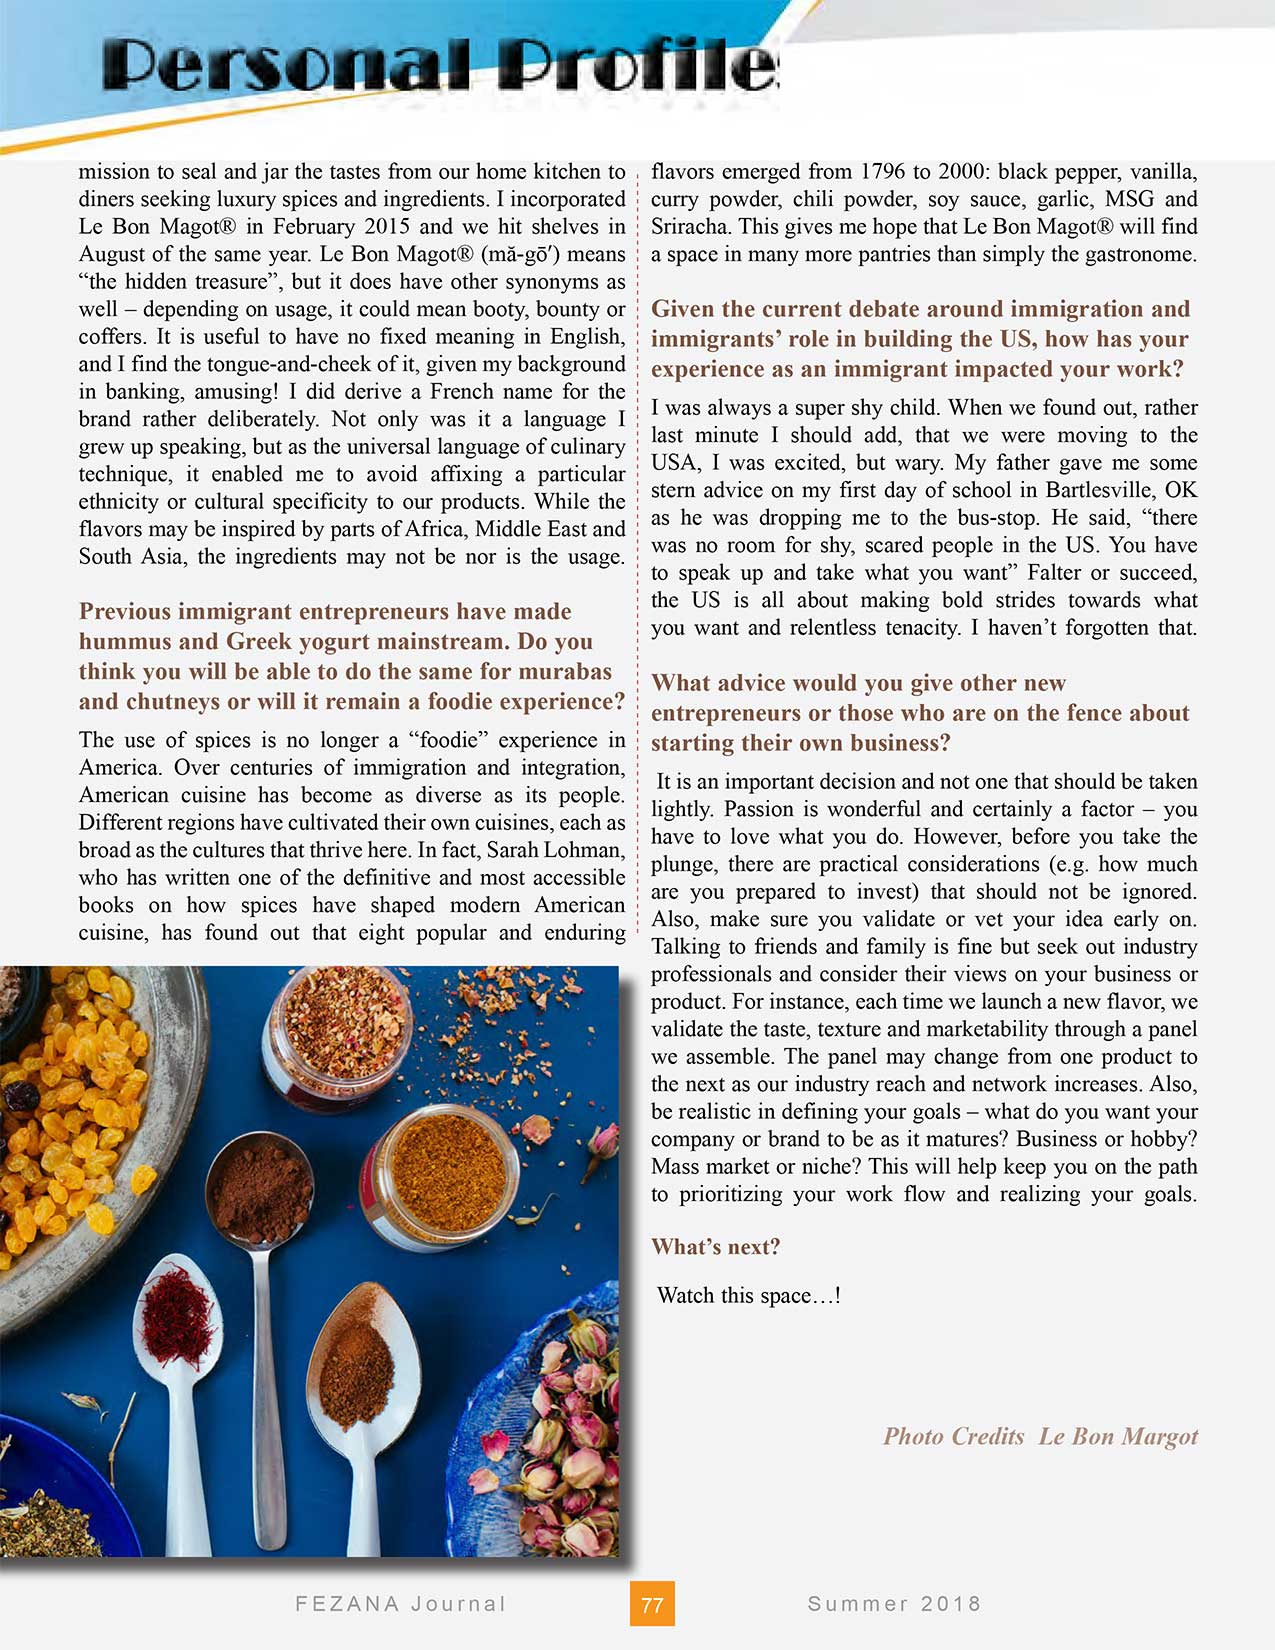 FEZANA_SUMMER-2018-page-2.jpg